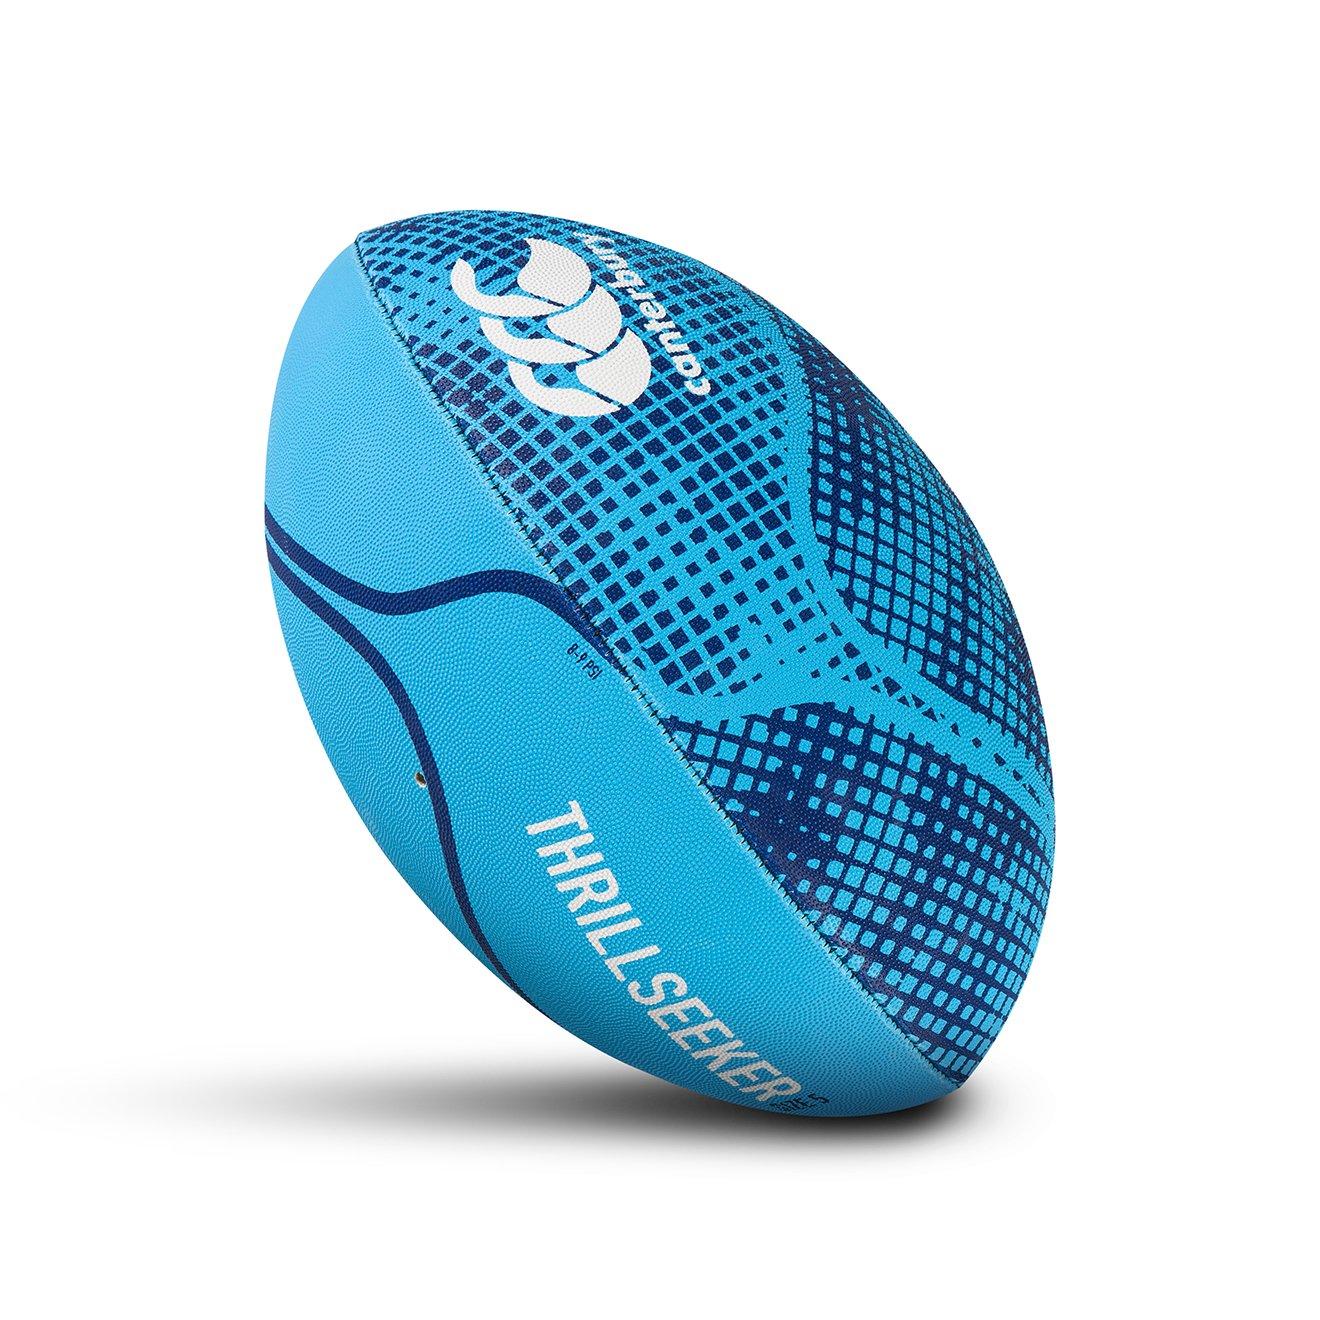 Canterbury Unisex Thrillseeker Rugby Ball